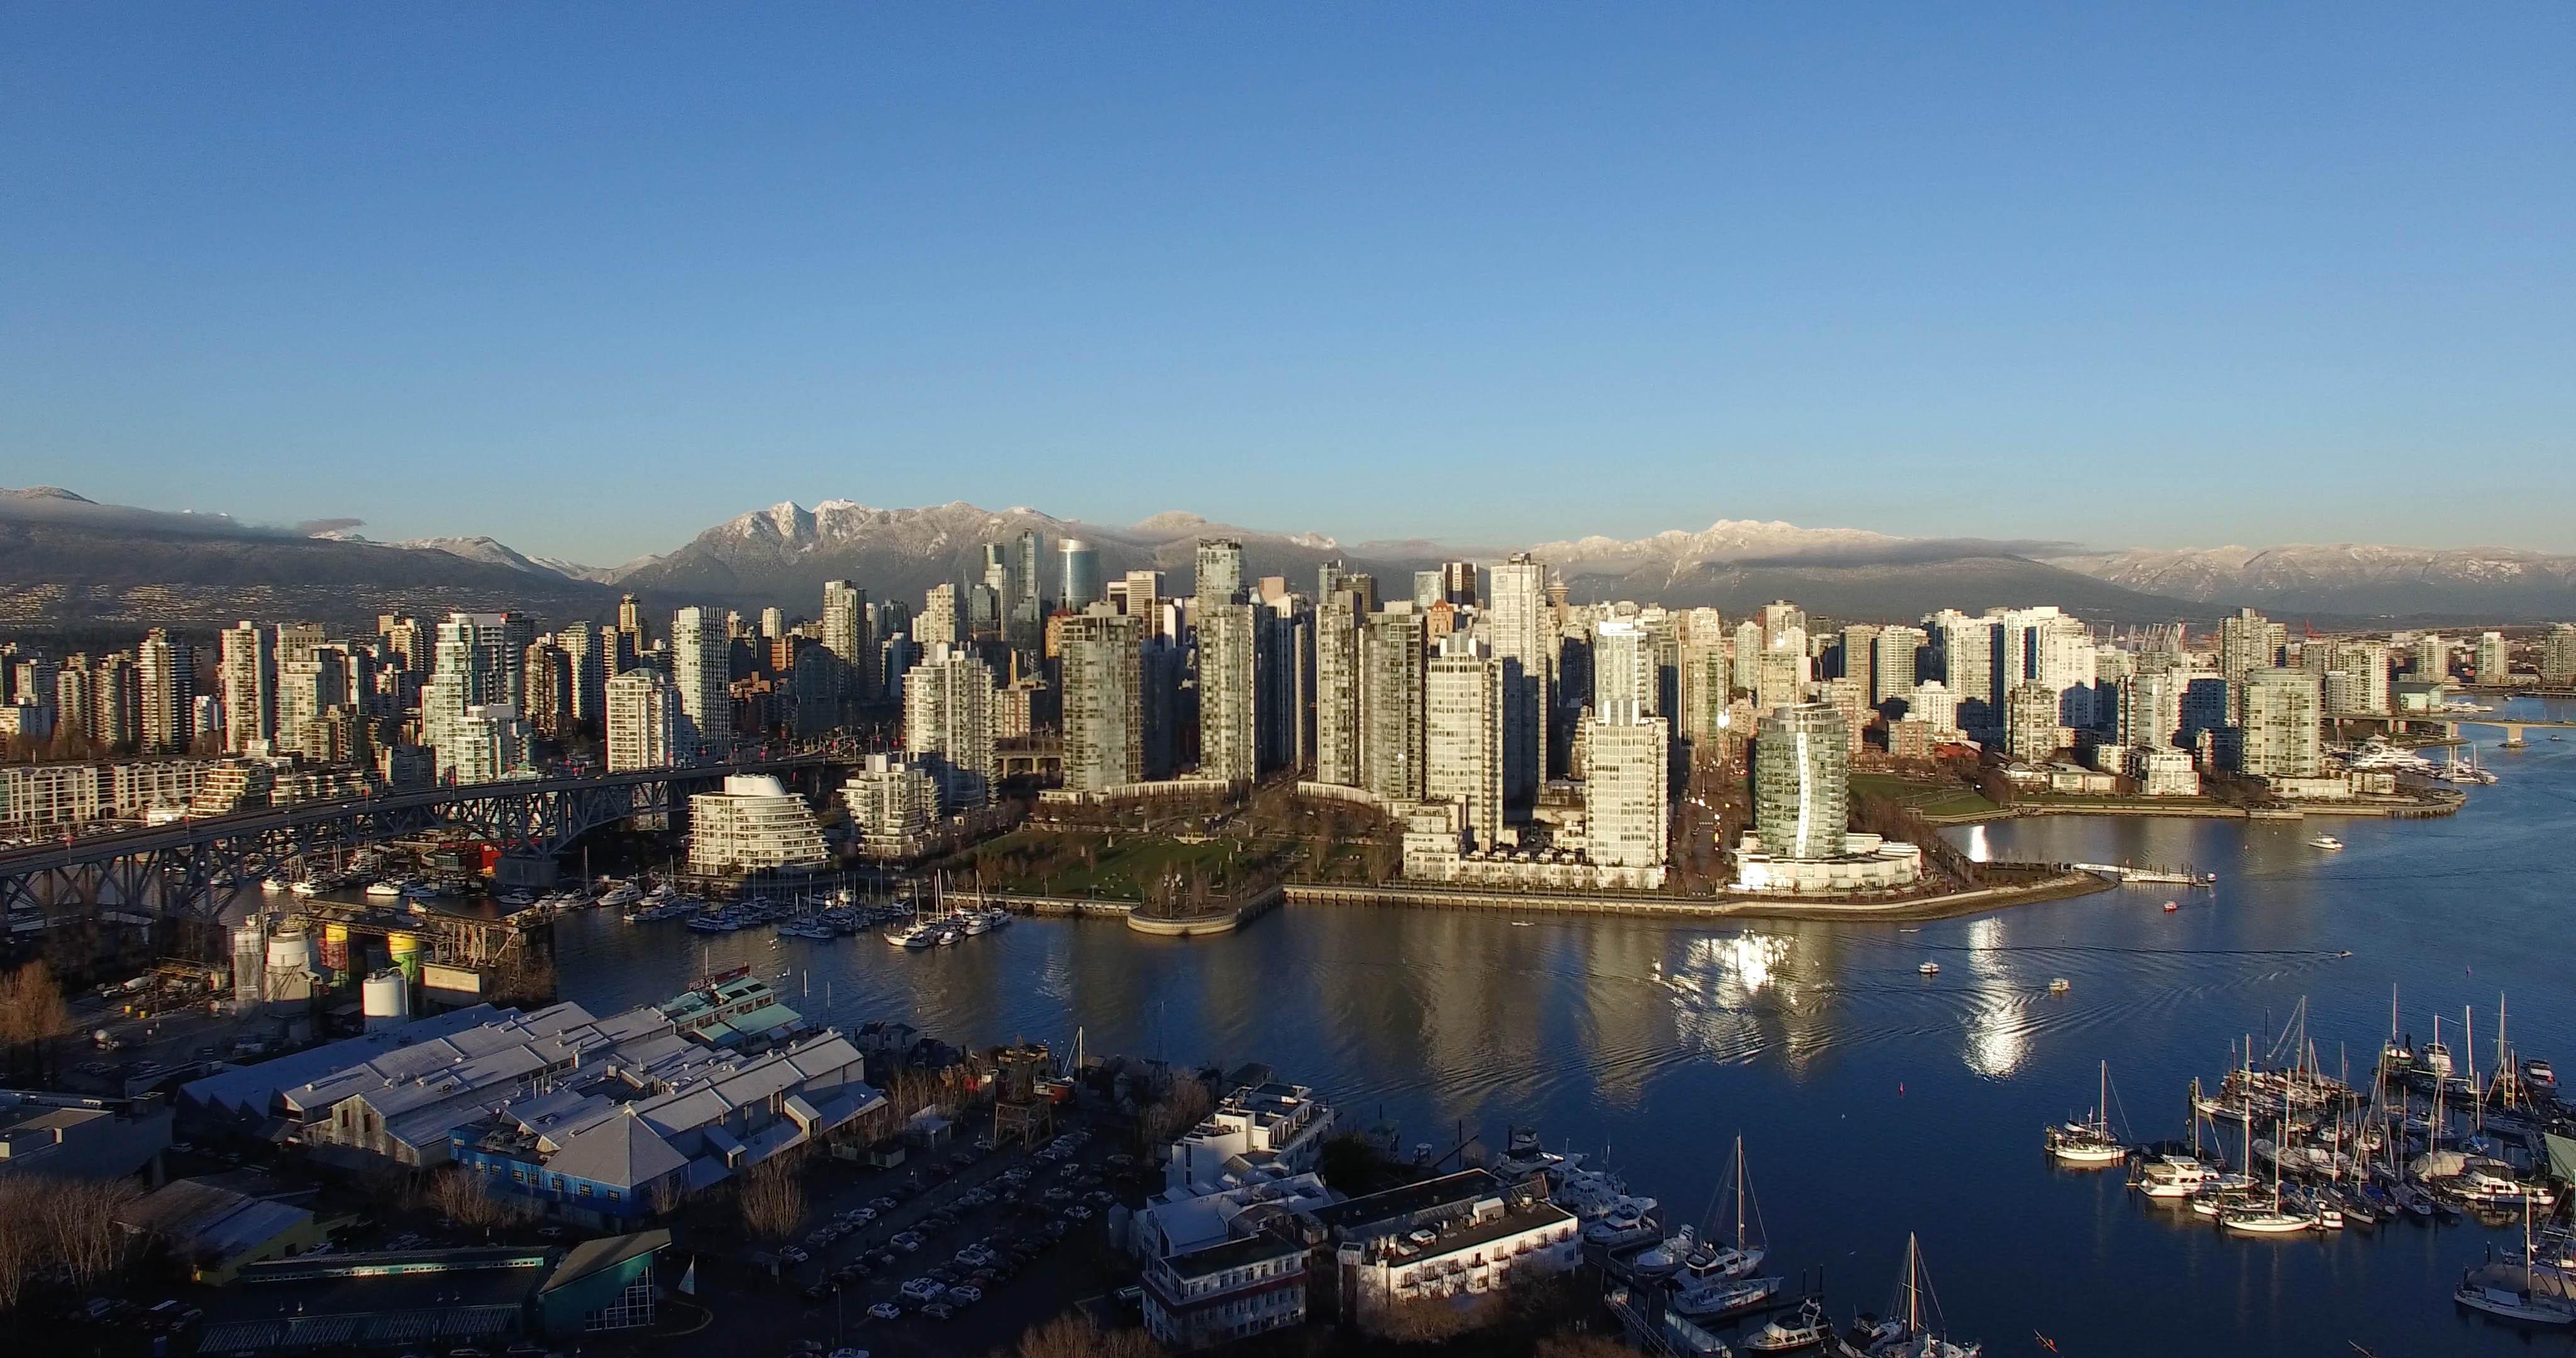 Drone Aerial Photos around the world